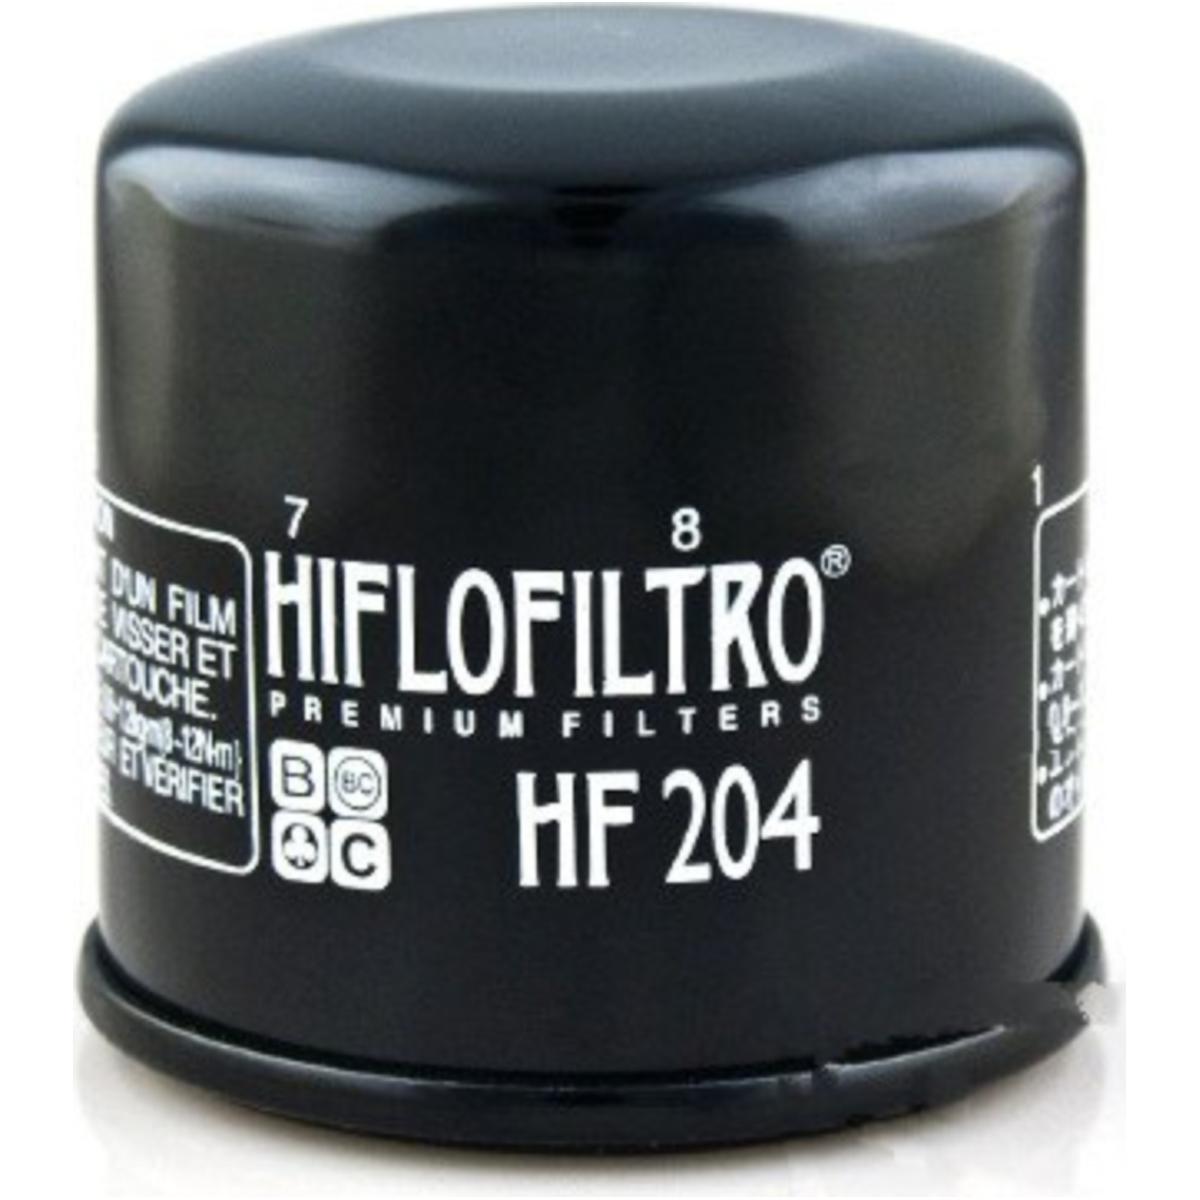 ölfilter Hiflo Hf204 Triumph Bonneville Efi Db02 1 2018 85914 900 48